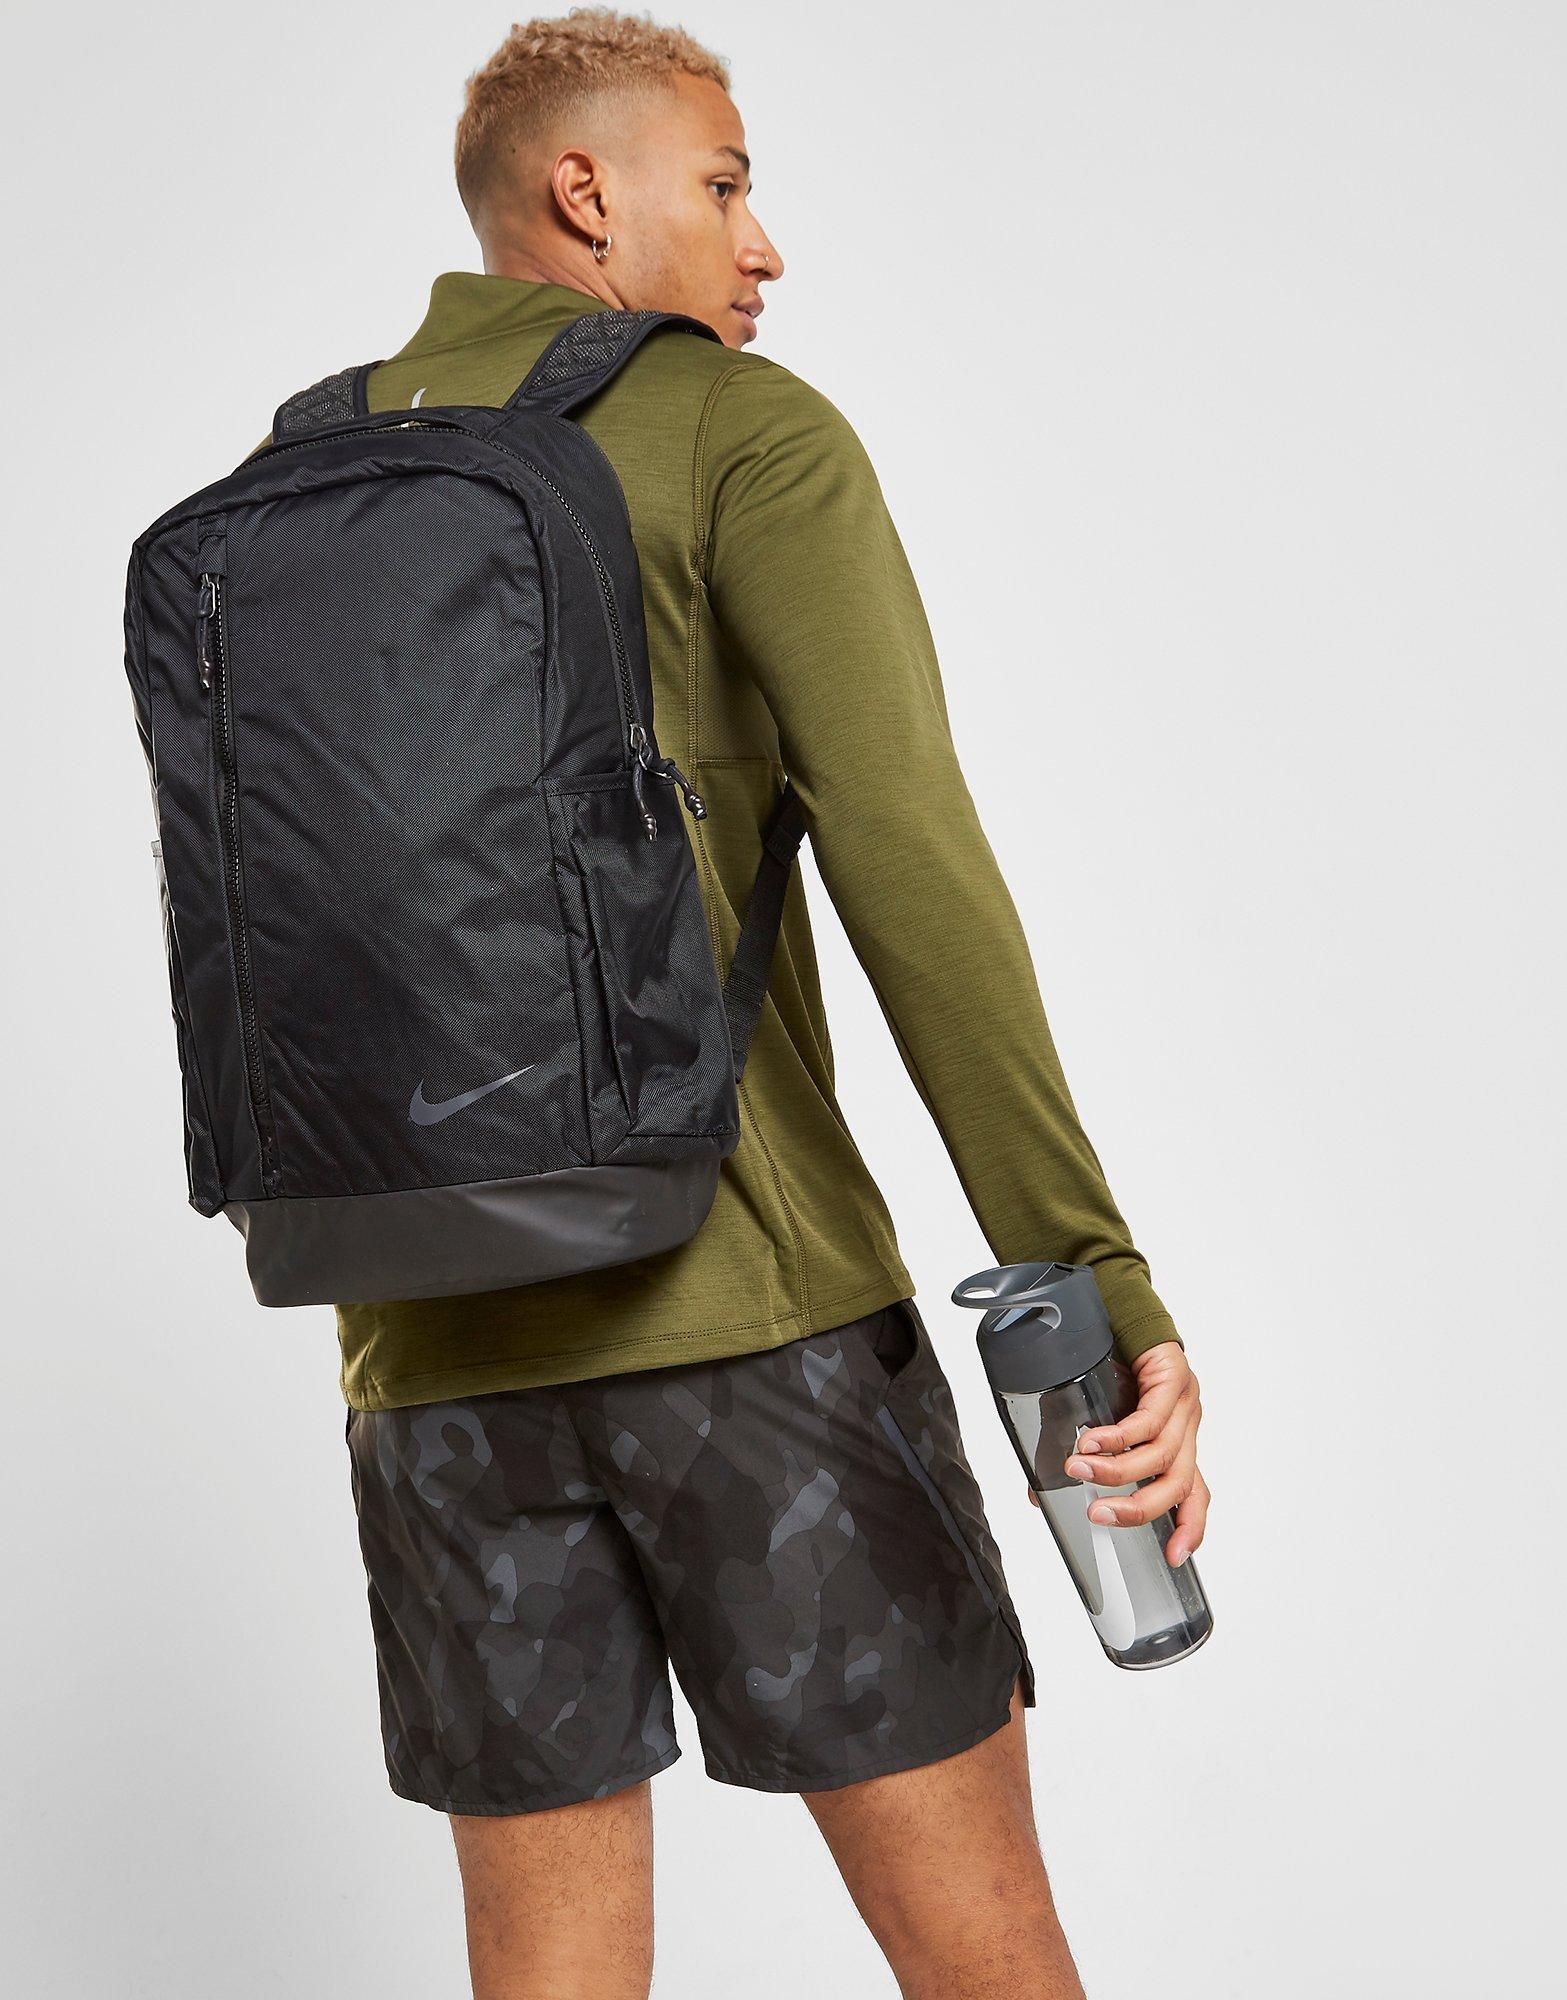 2312364716 NIKE Nike Vapor Power 2.0 Training Backpack | JD Sports